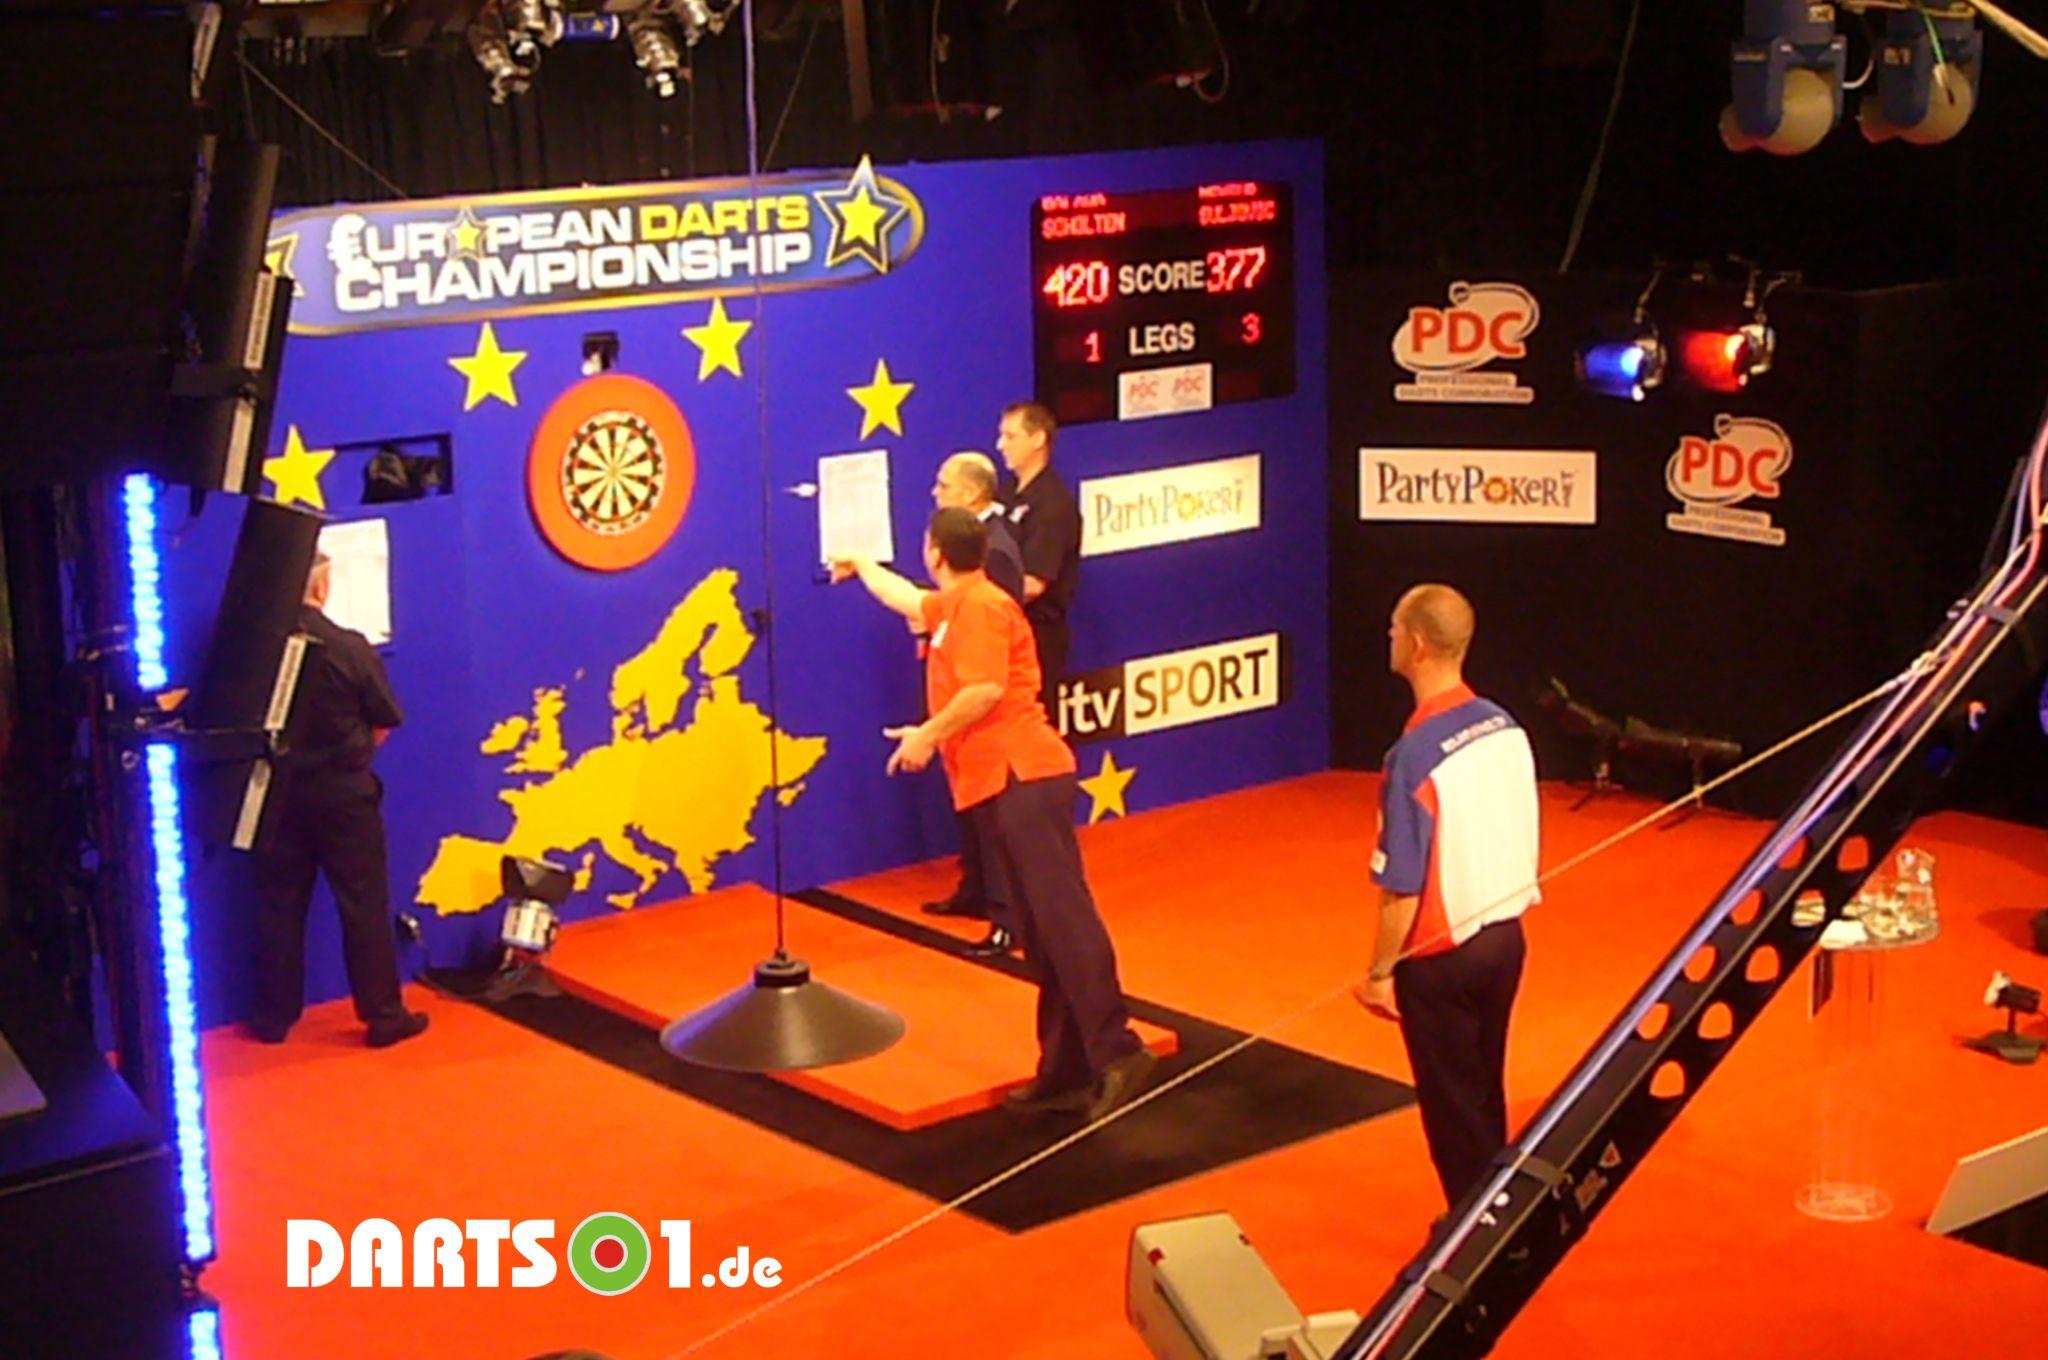 European-Darts-Championship